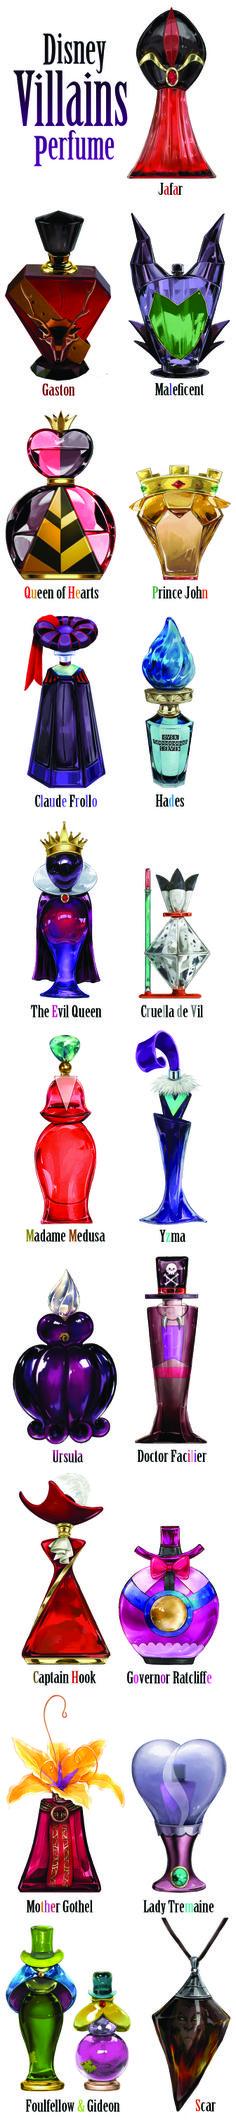 """Disney Villains Perfume"" by japanese artist Ruby Spark."